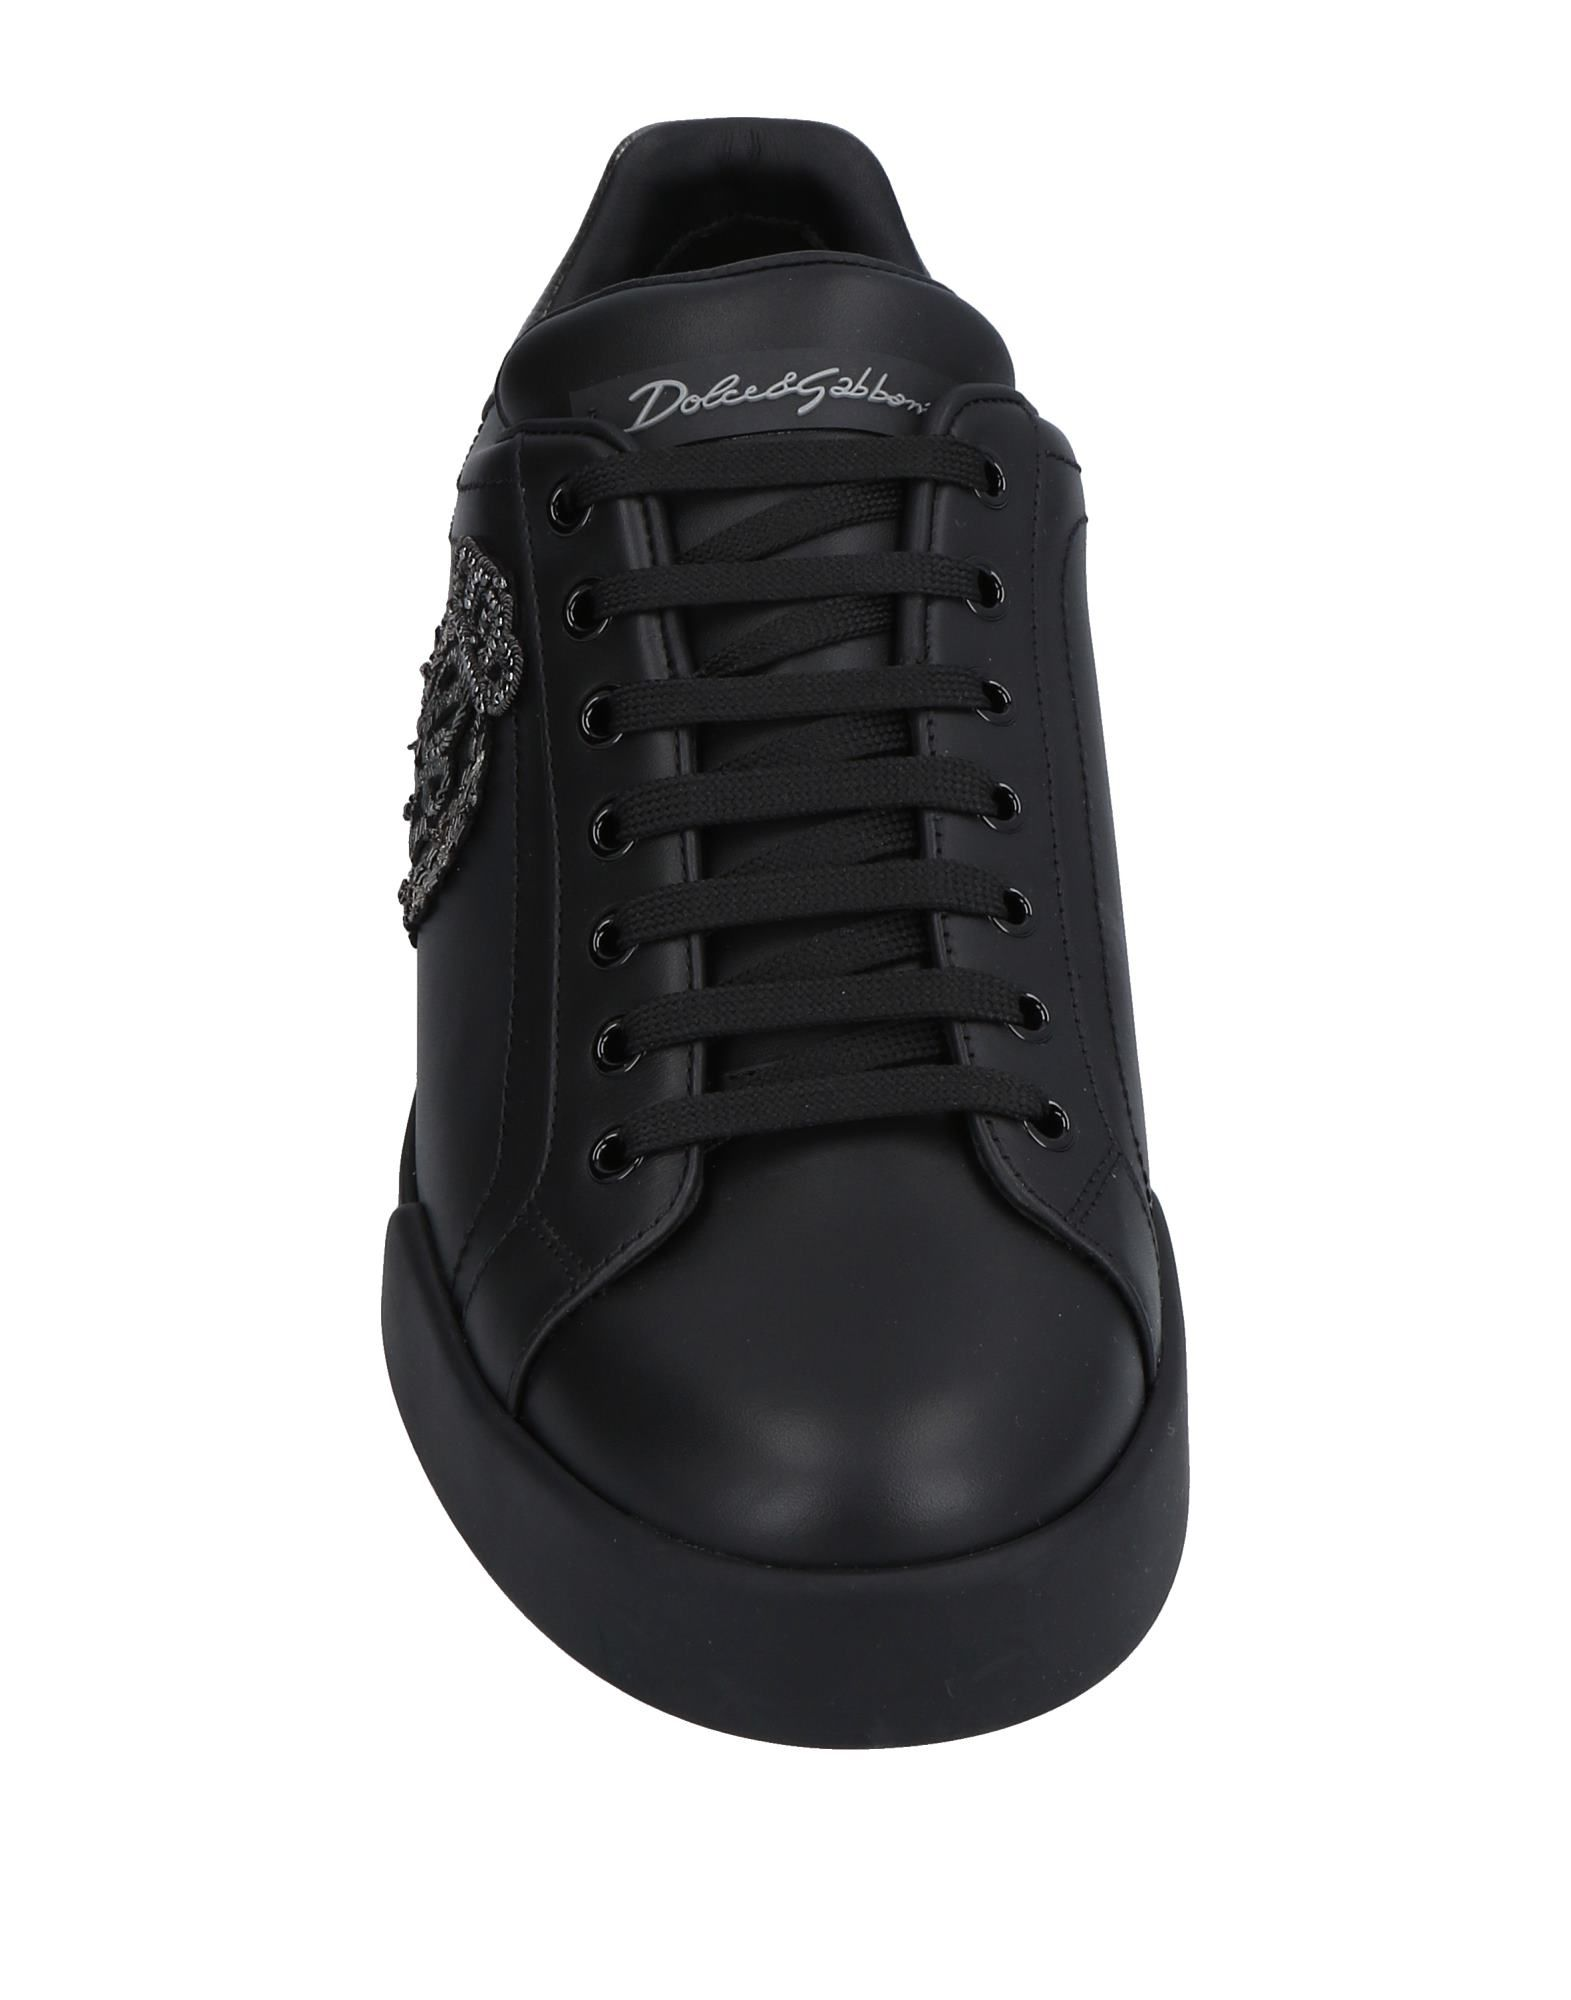 Dolce & Gabbana Sneakers Neue Herren  11500109SE Neue Sneakers Schuhe 05f2d2